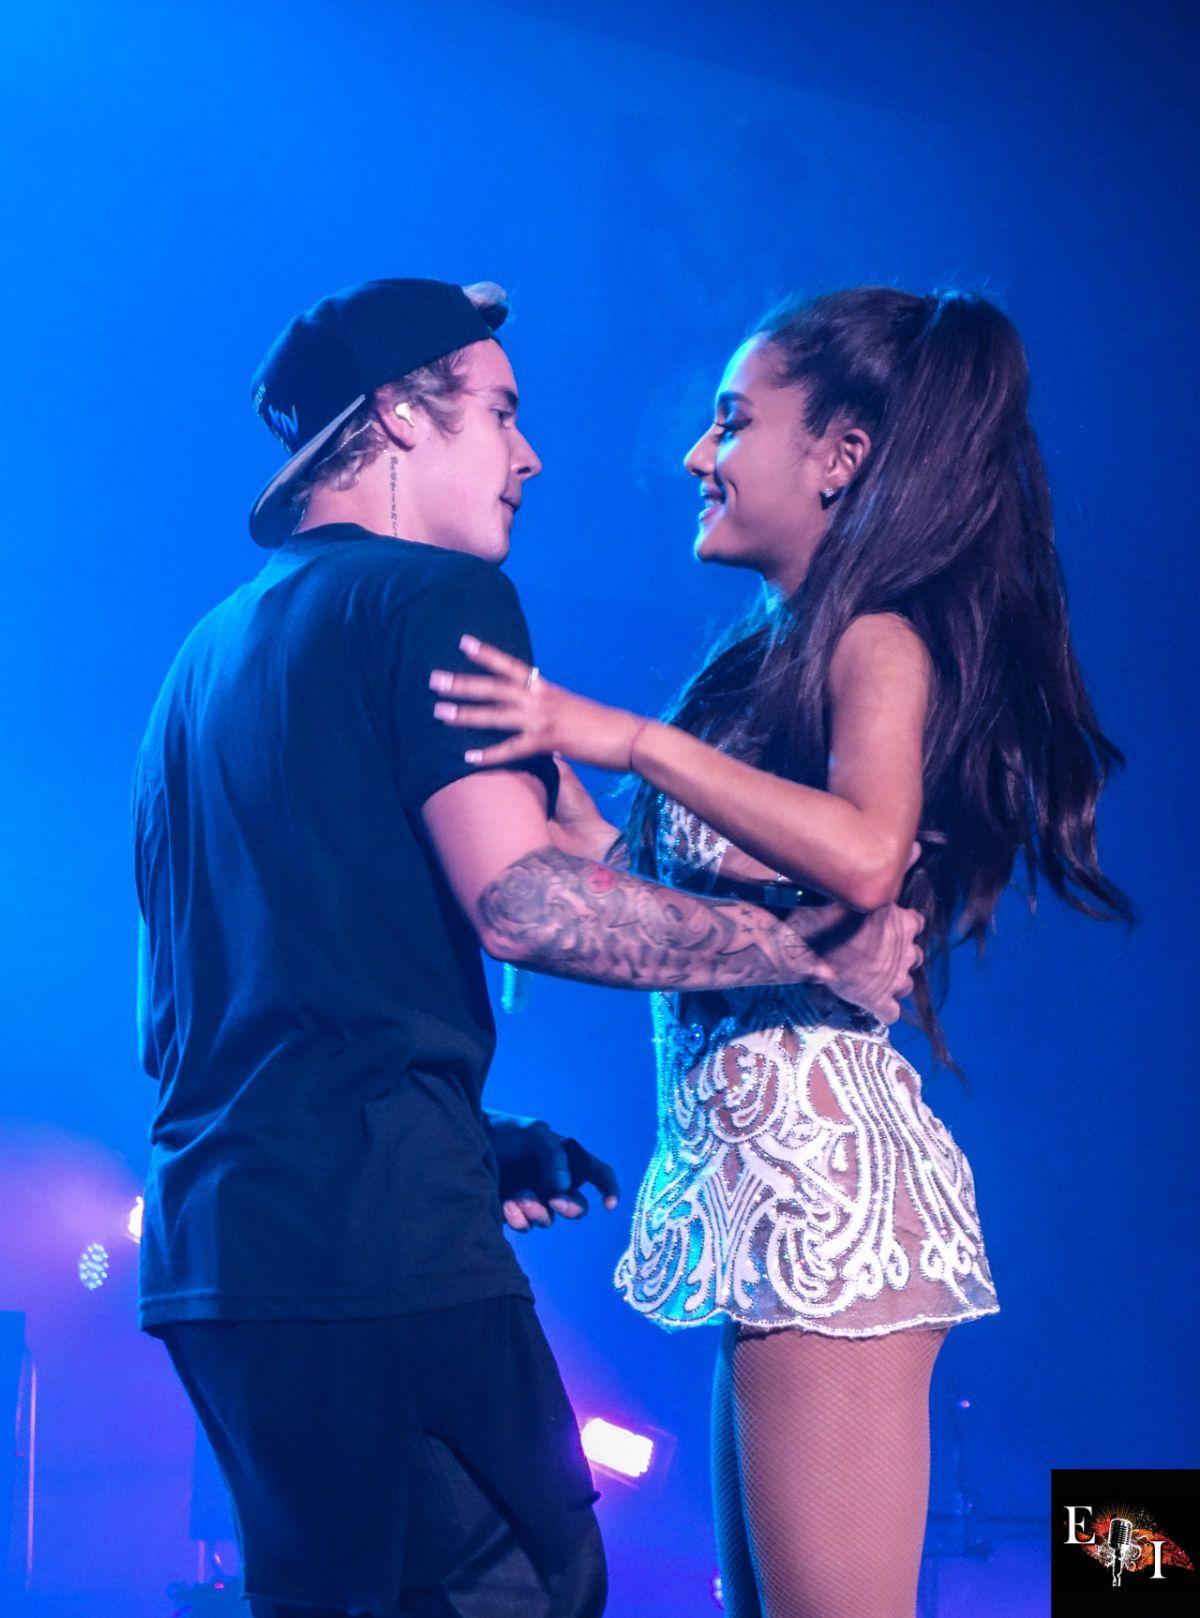 Justin Bieber Ariana Grande 2015 Ariana Grande And Justin